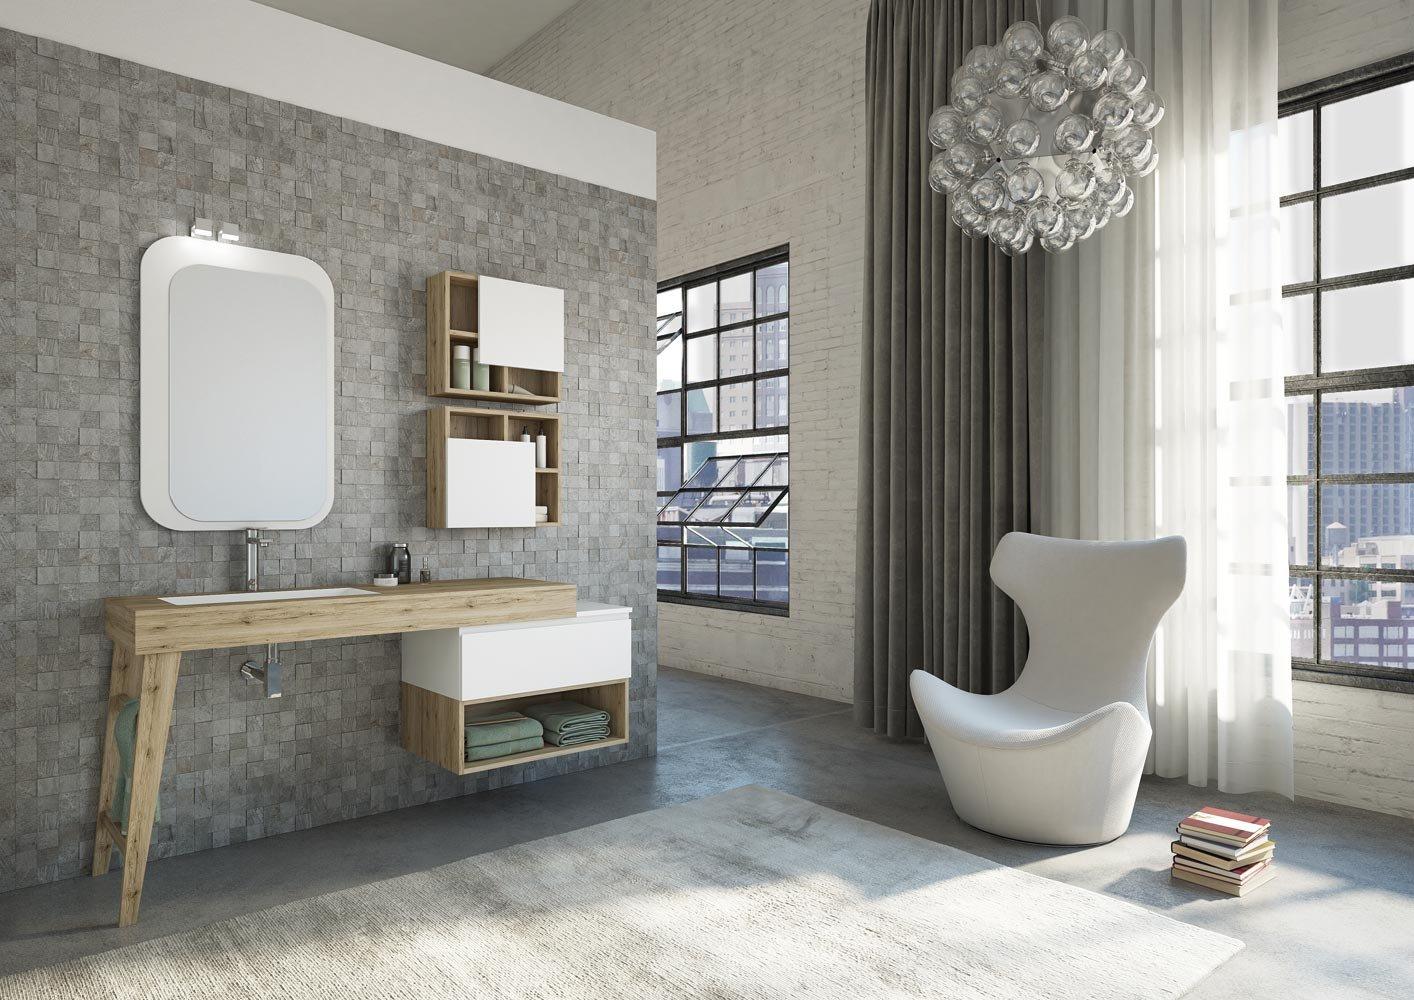 Vasca Da Bagno Bianco Opaco : Come lucidare una vasca da bagno opaca o ingiallita